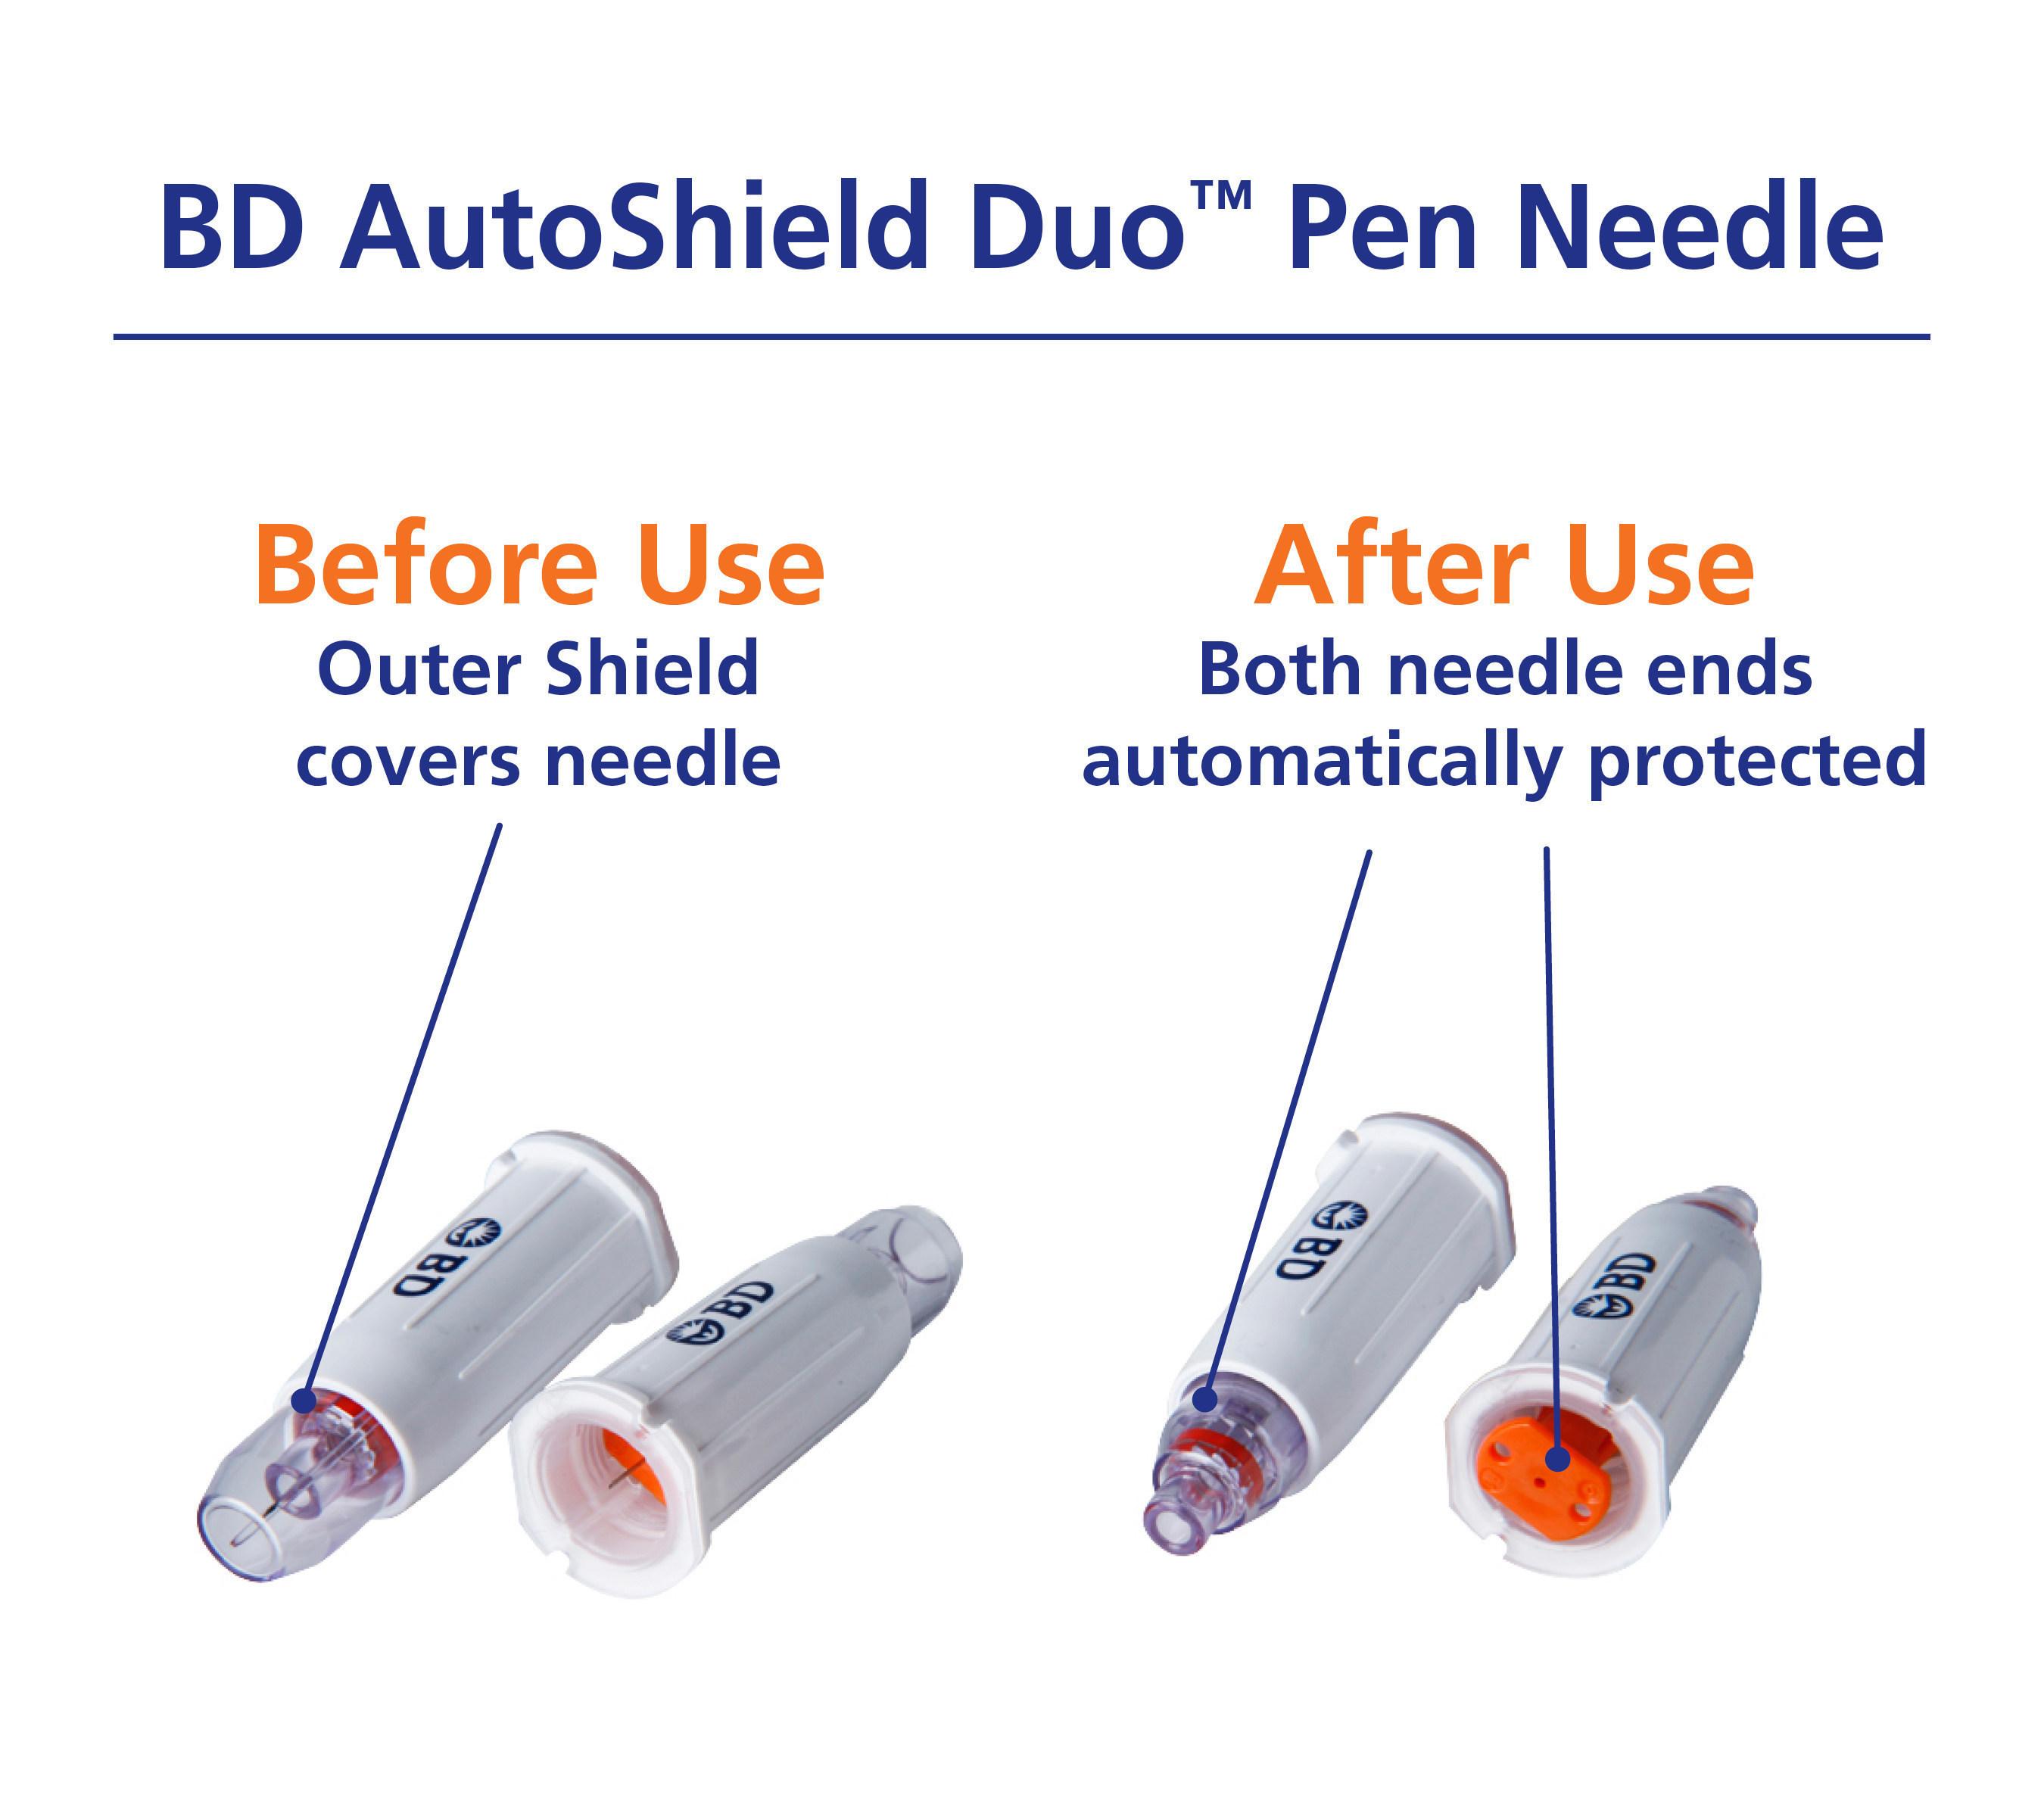 BD AutoShield Duo (TM) Pen Needle